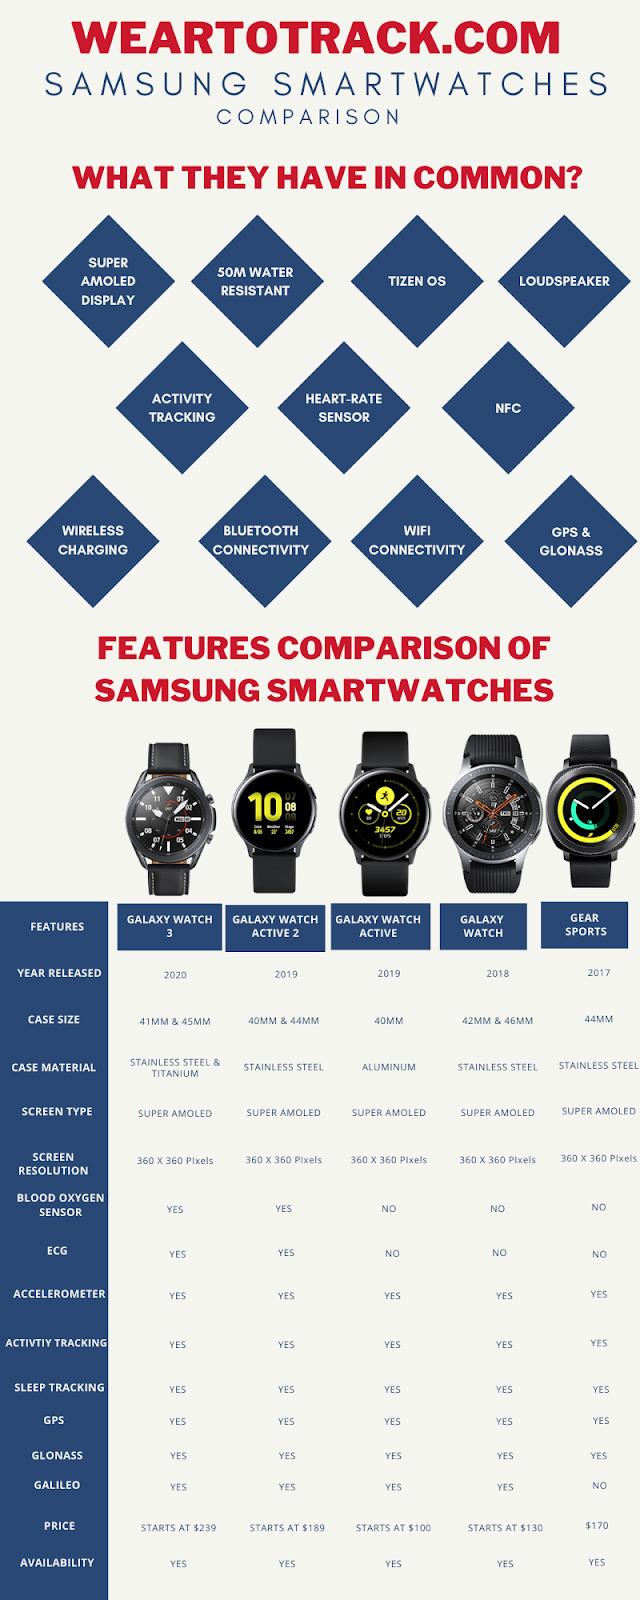 Samsung Watches comparison chart